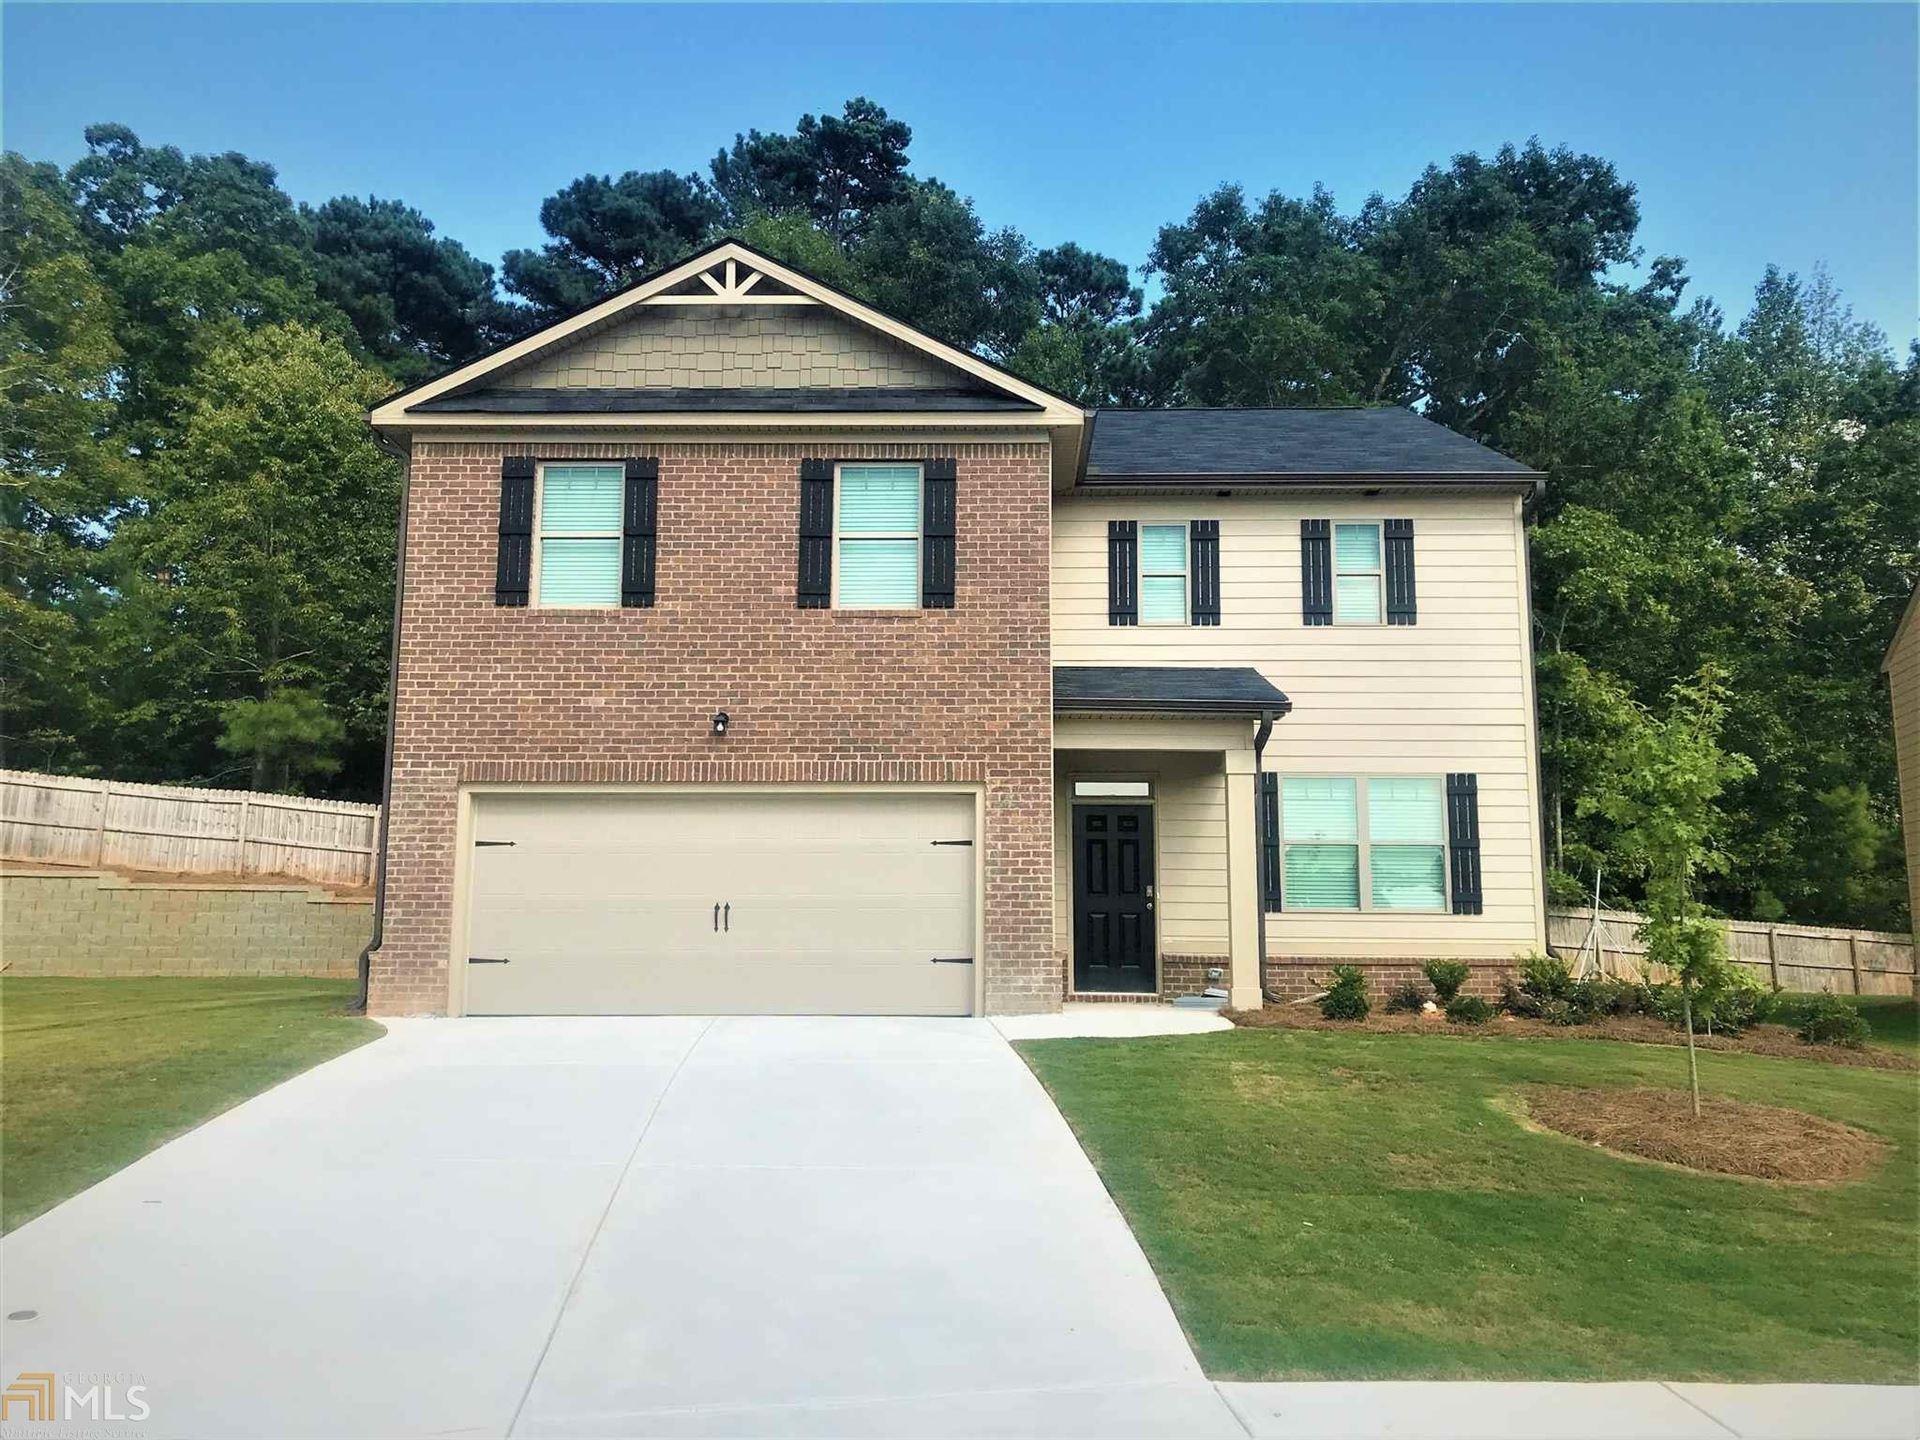 1712 Alford Dr, Jonesboro, GA 30236 - #: 8840959